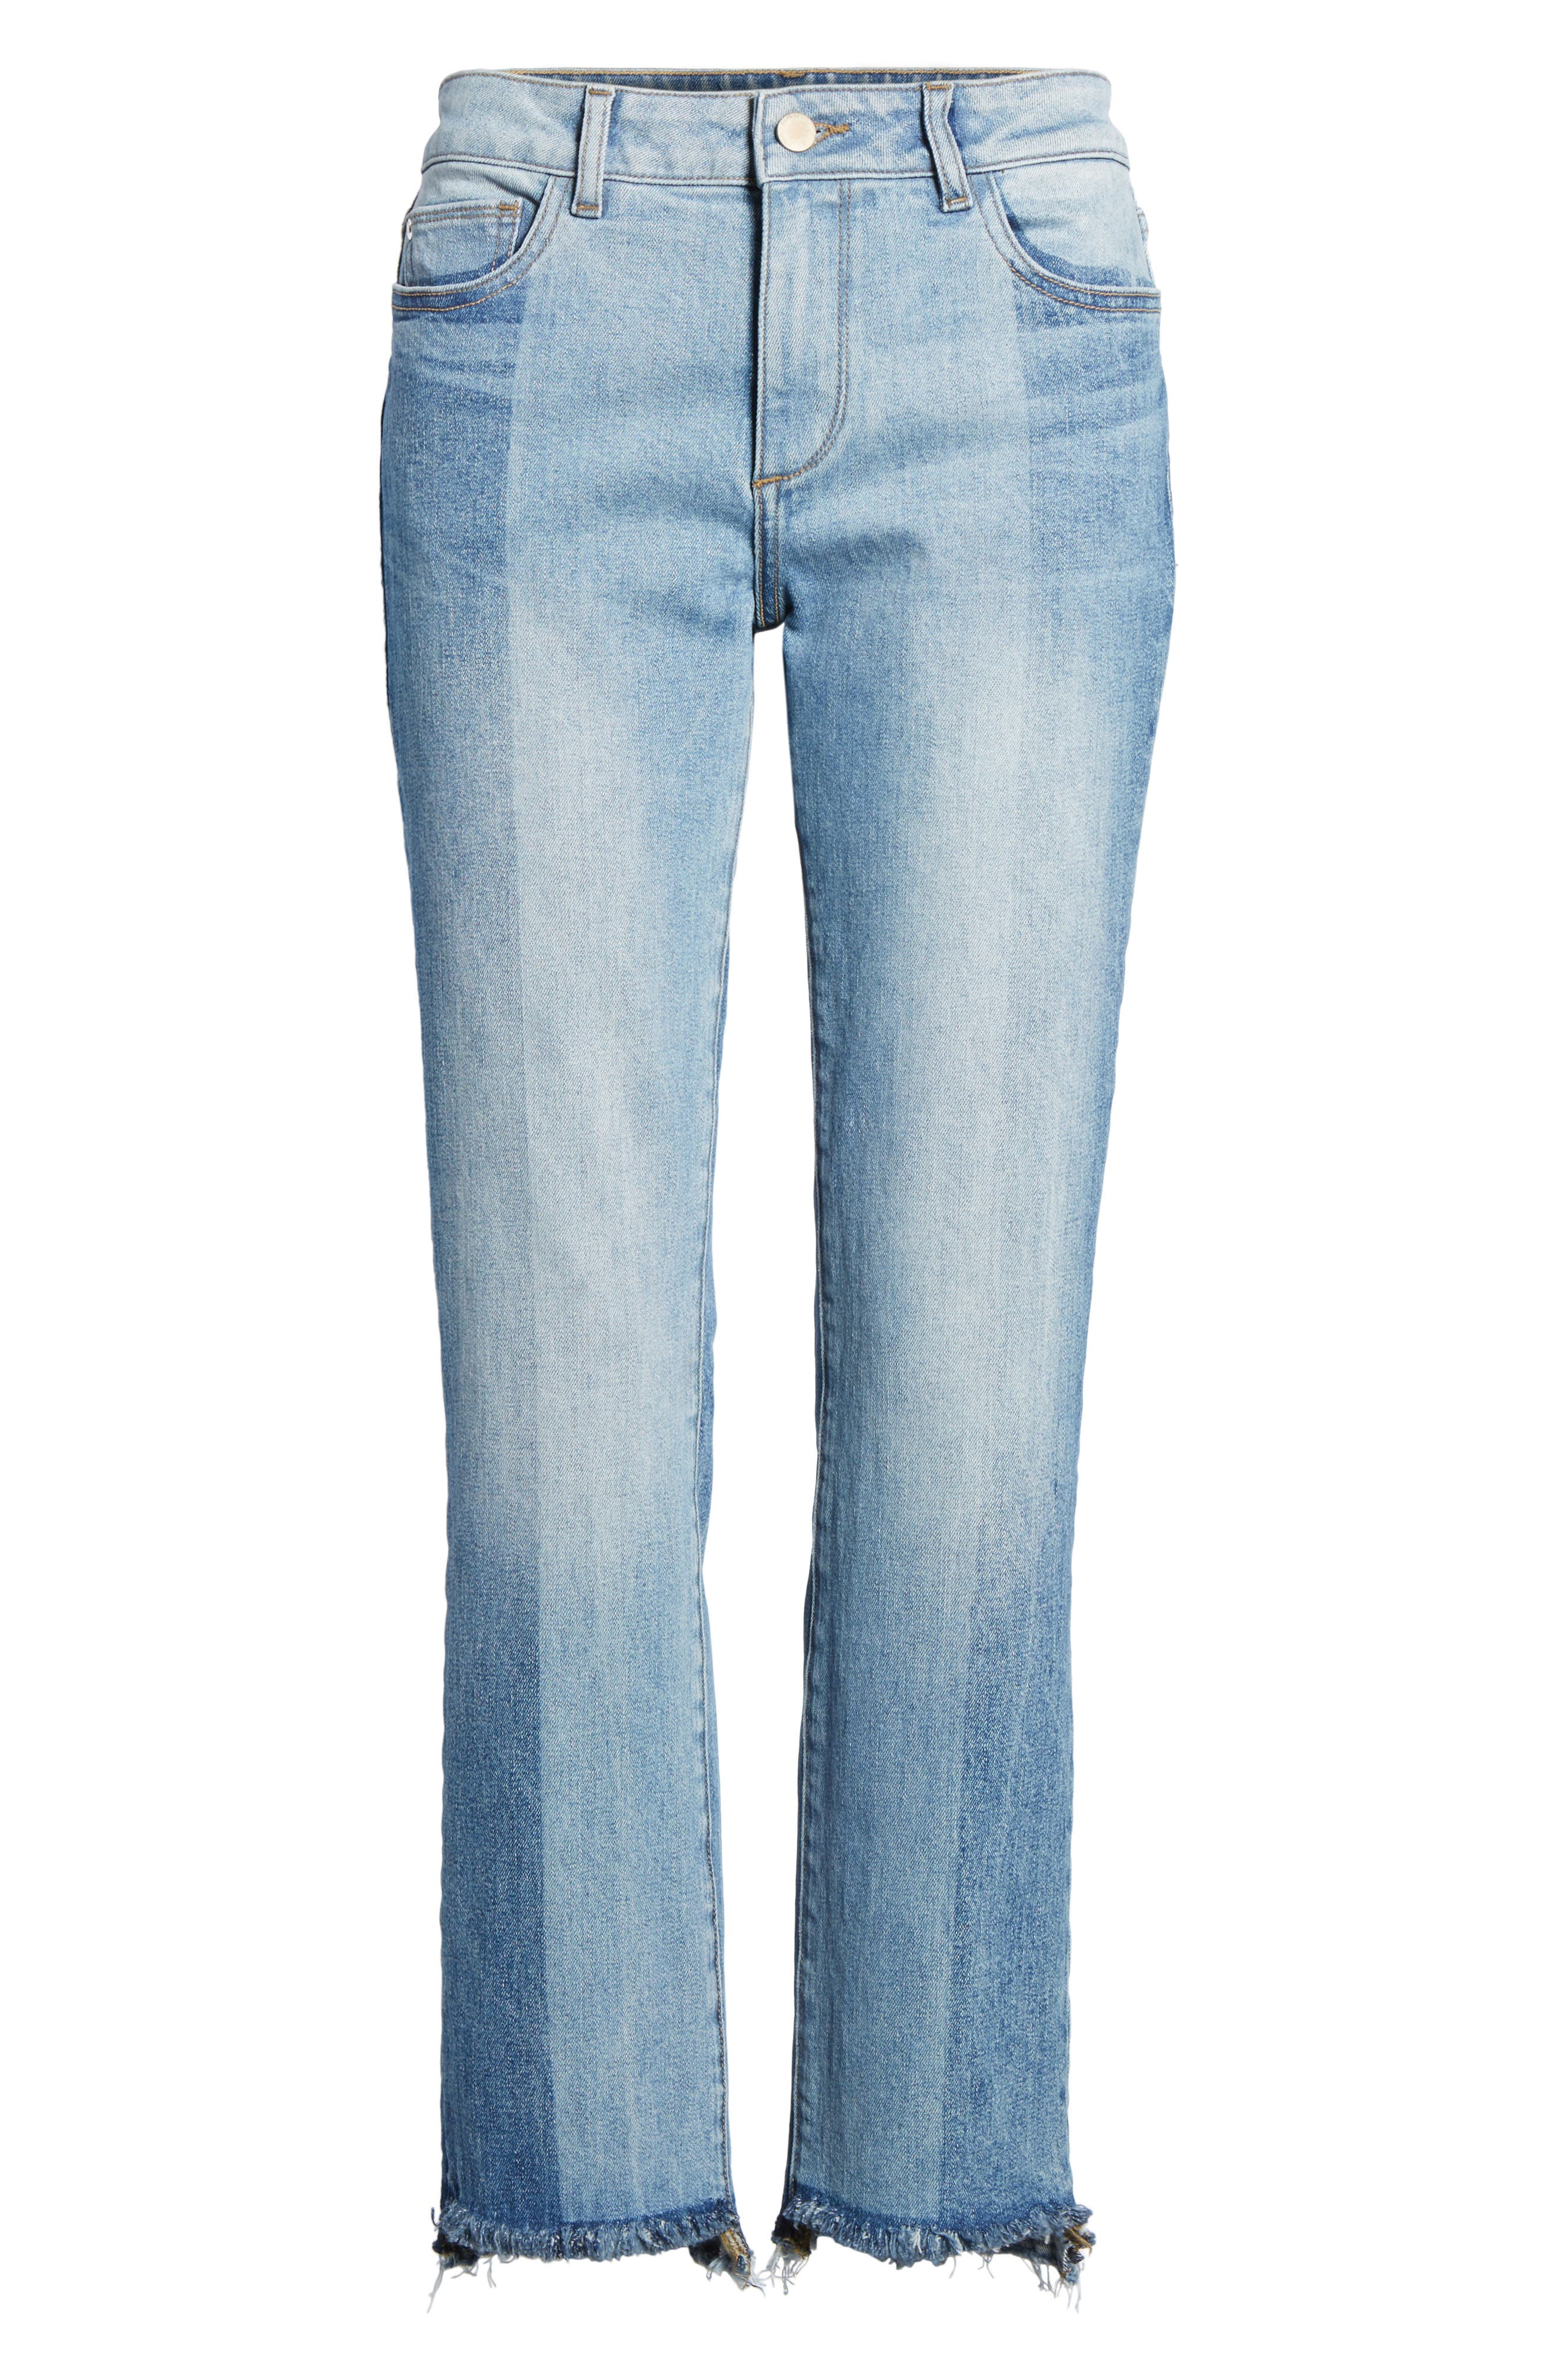 Mara Step Hem Ankle Jeans,                             Alternate thumbnail 7, color,                             425